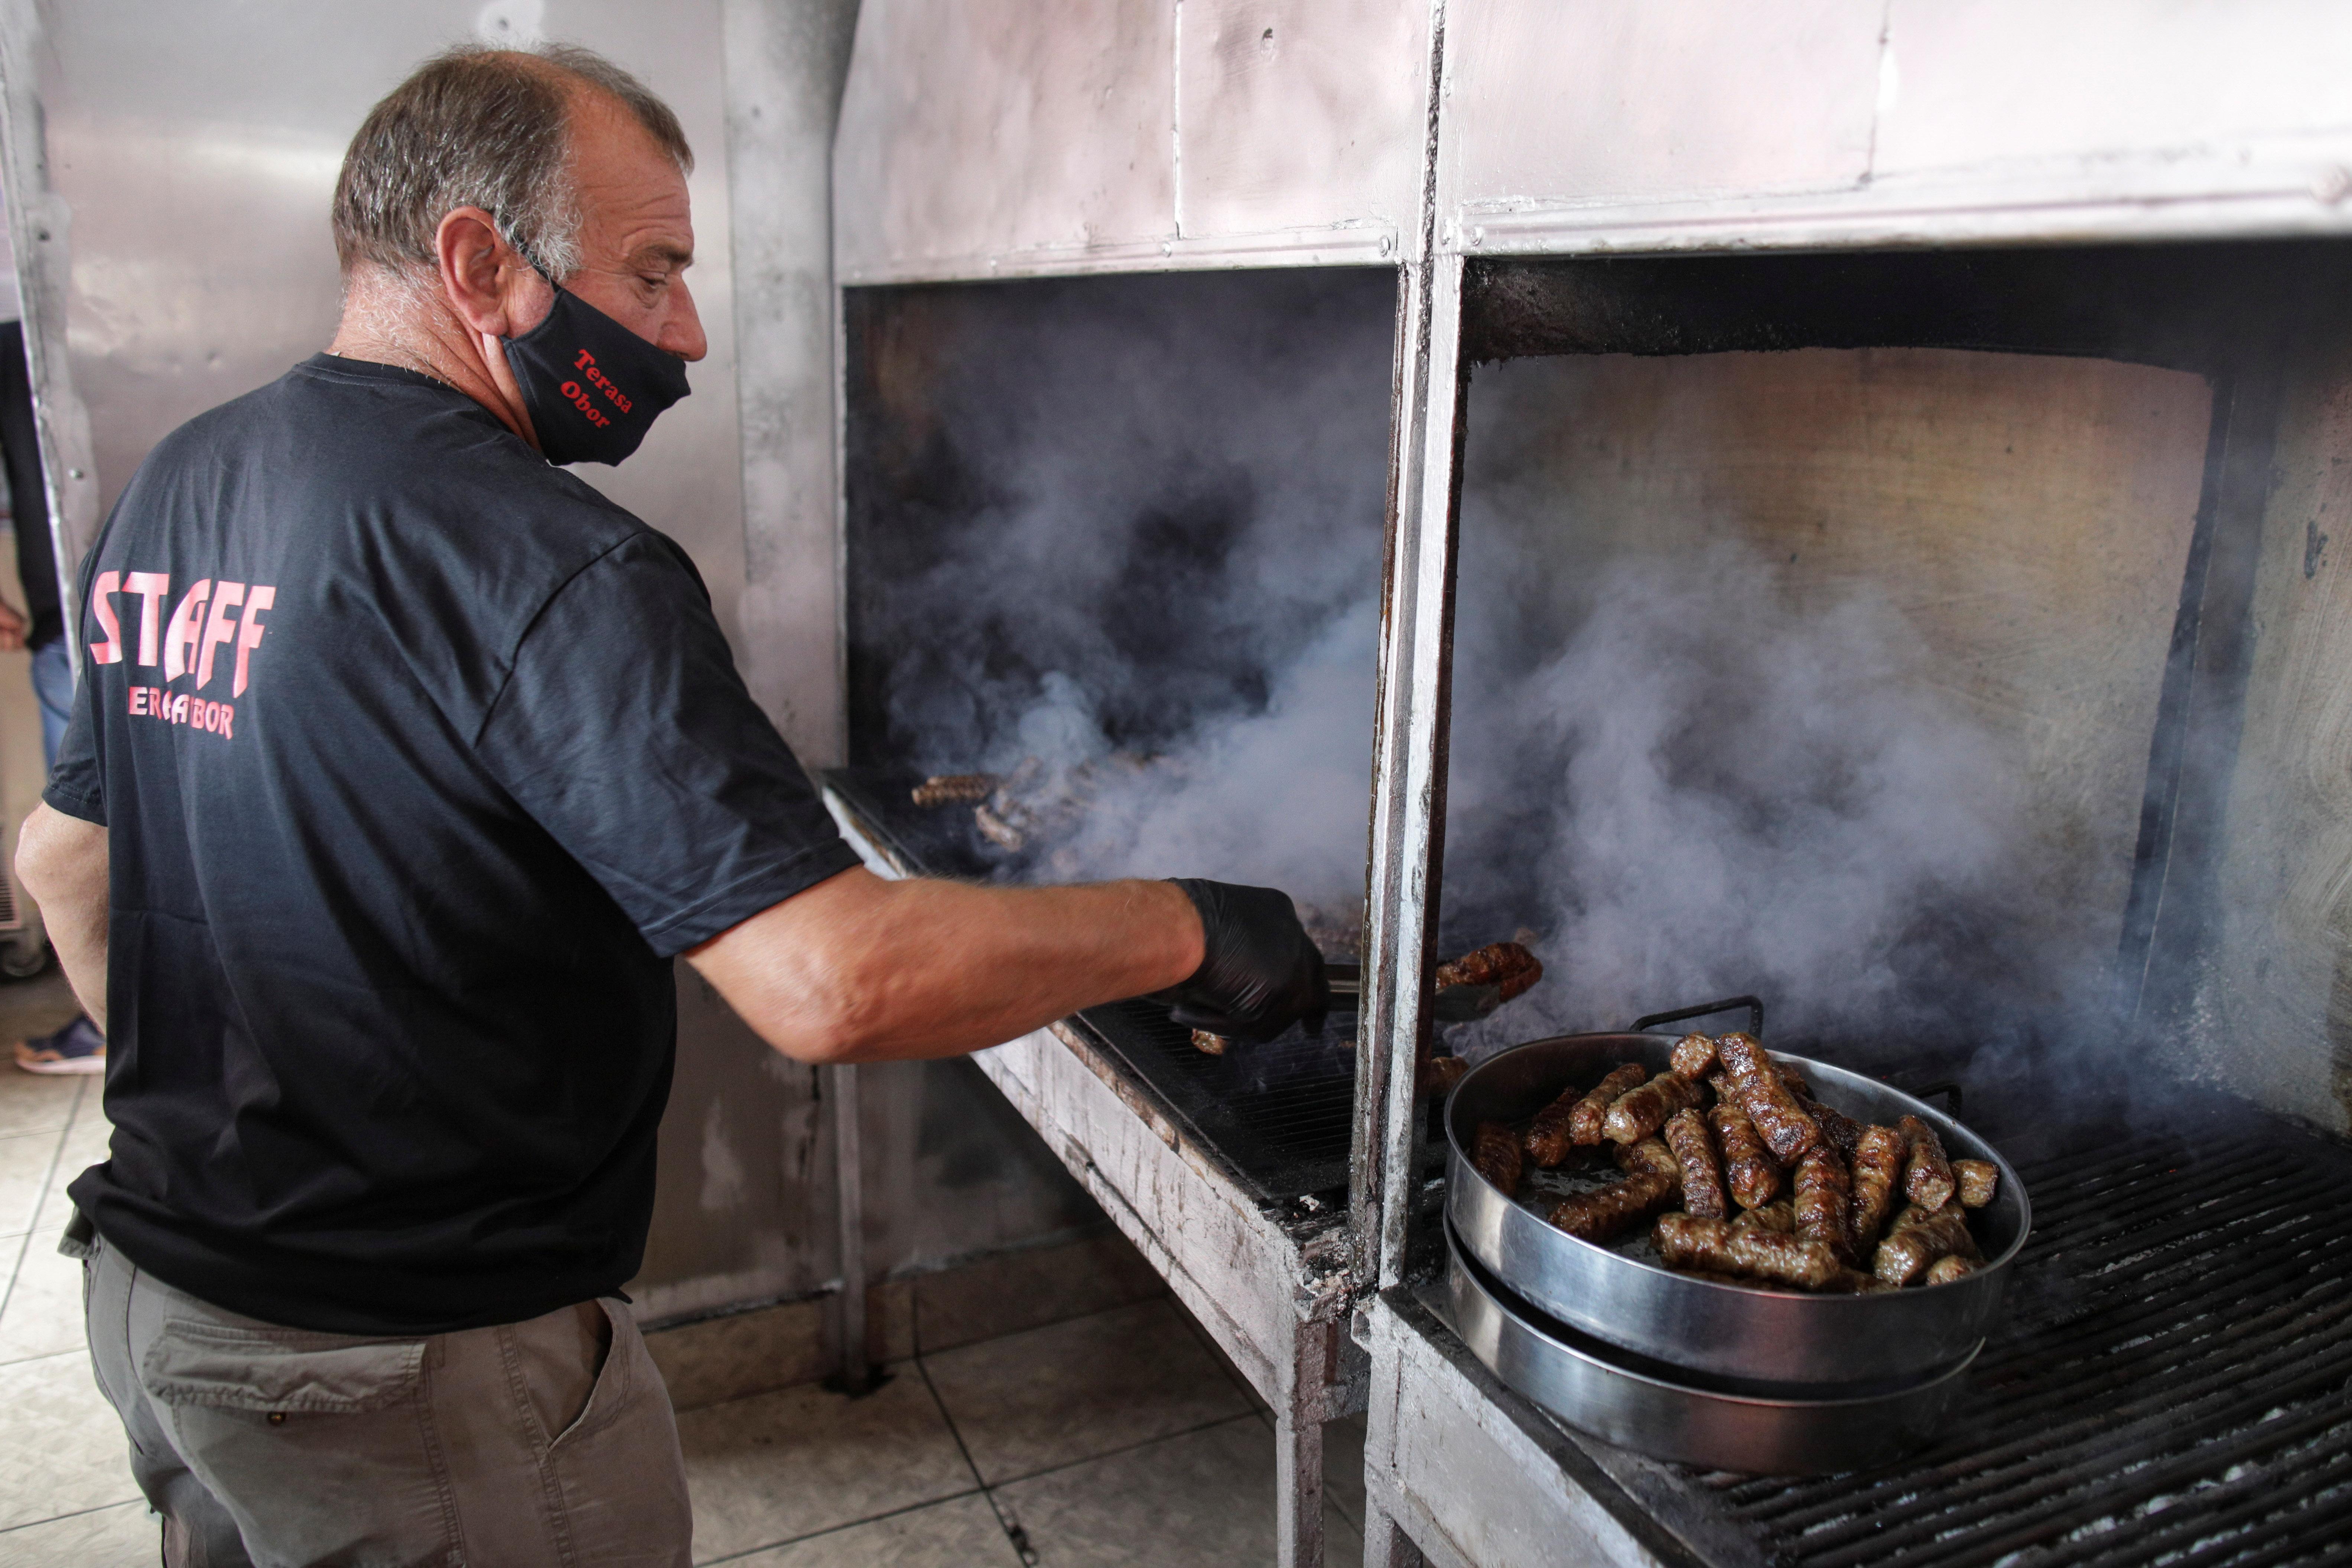 A man grills traditional Romanian minced meat rolls called 'mici' in Bucharest, Romania, June 11, 2021. Inquam Photos/Octav Ganea via REUTERS